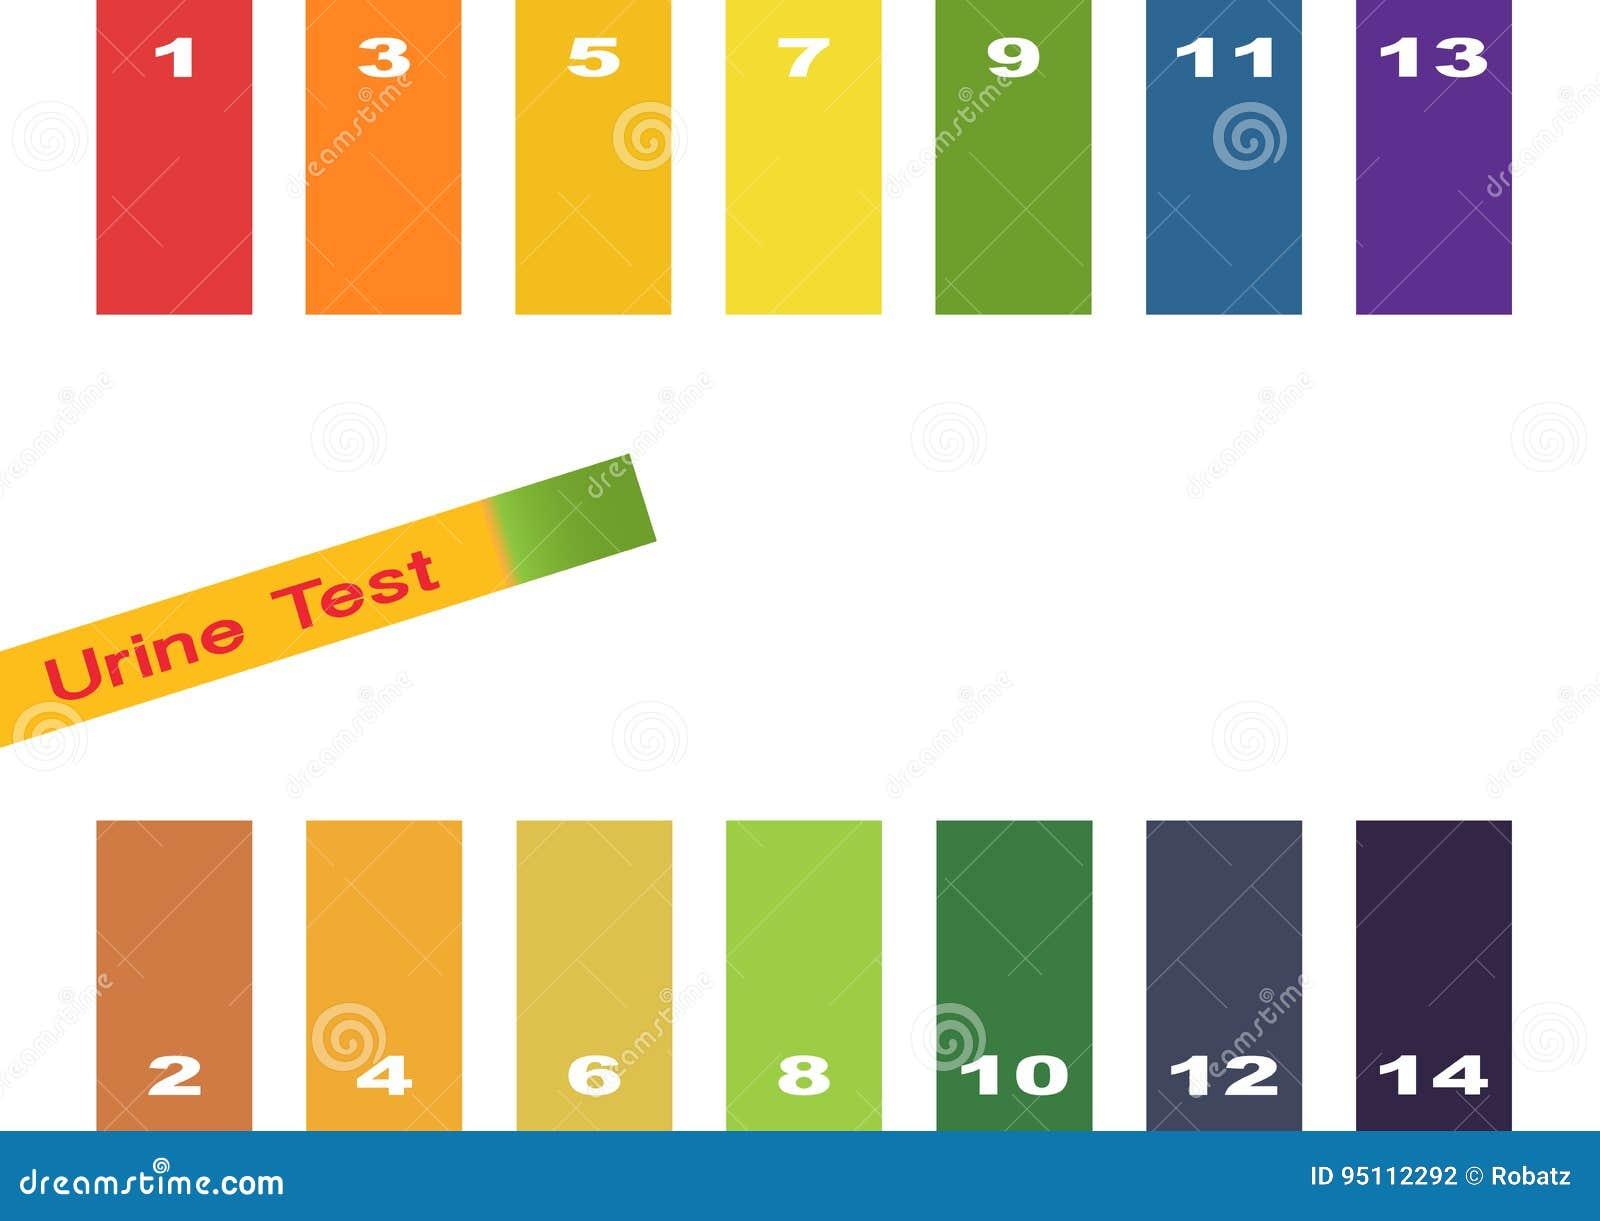 Ph scale litmus paper color chart vector illustration ph scale litmus paper color chart vector illustration cartoondealer 80714662 nvjuhfo Images